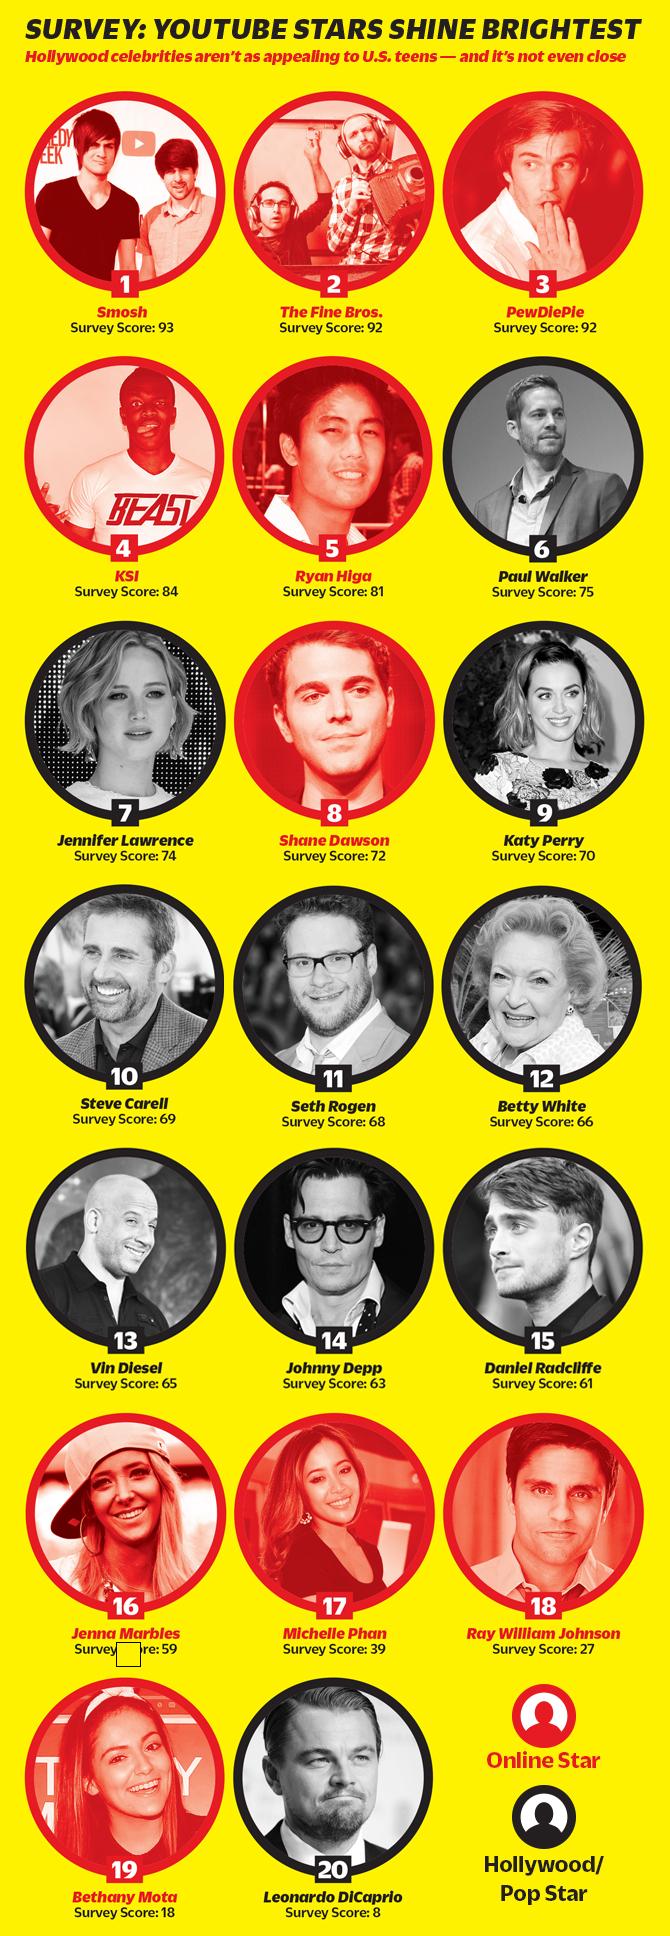 (From   http://variety.com/2014/digital/news/survey-youtube-stars-more-popular-than-mainstream-celebs-among-u-s-teens-1201275245/  )